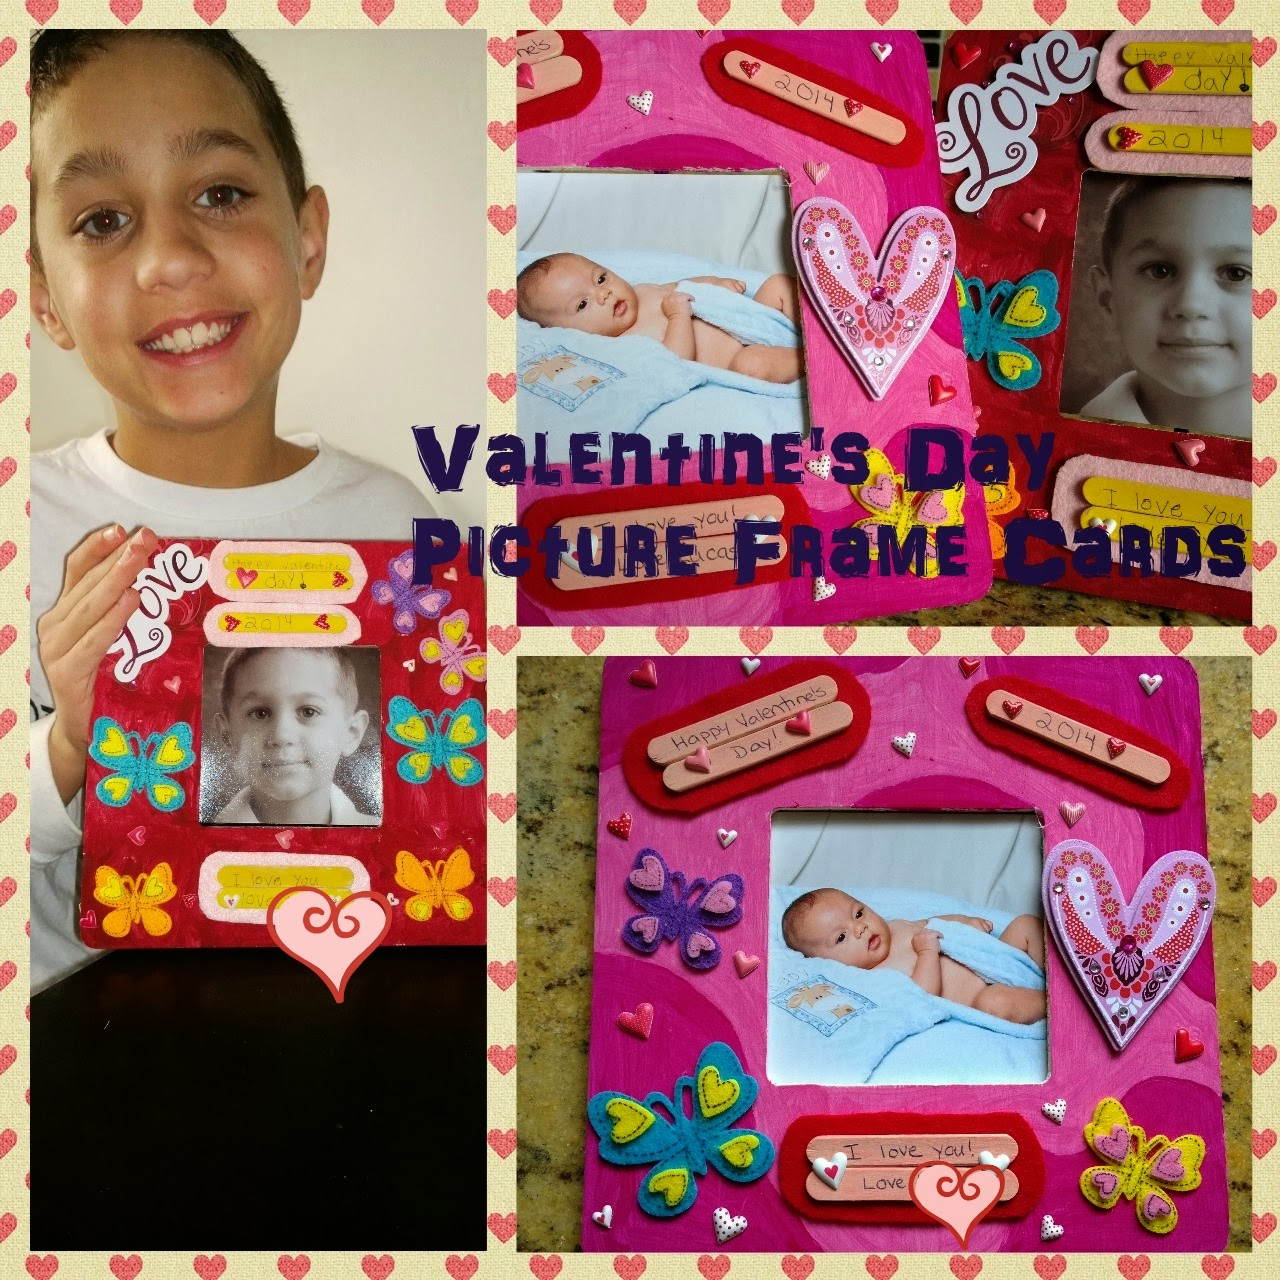 Valentine's Day Picture Frame Cards #shop #cbias